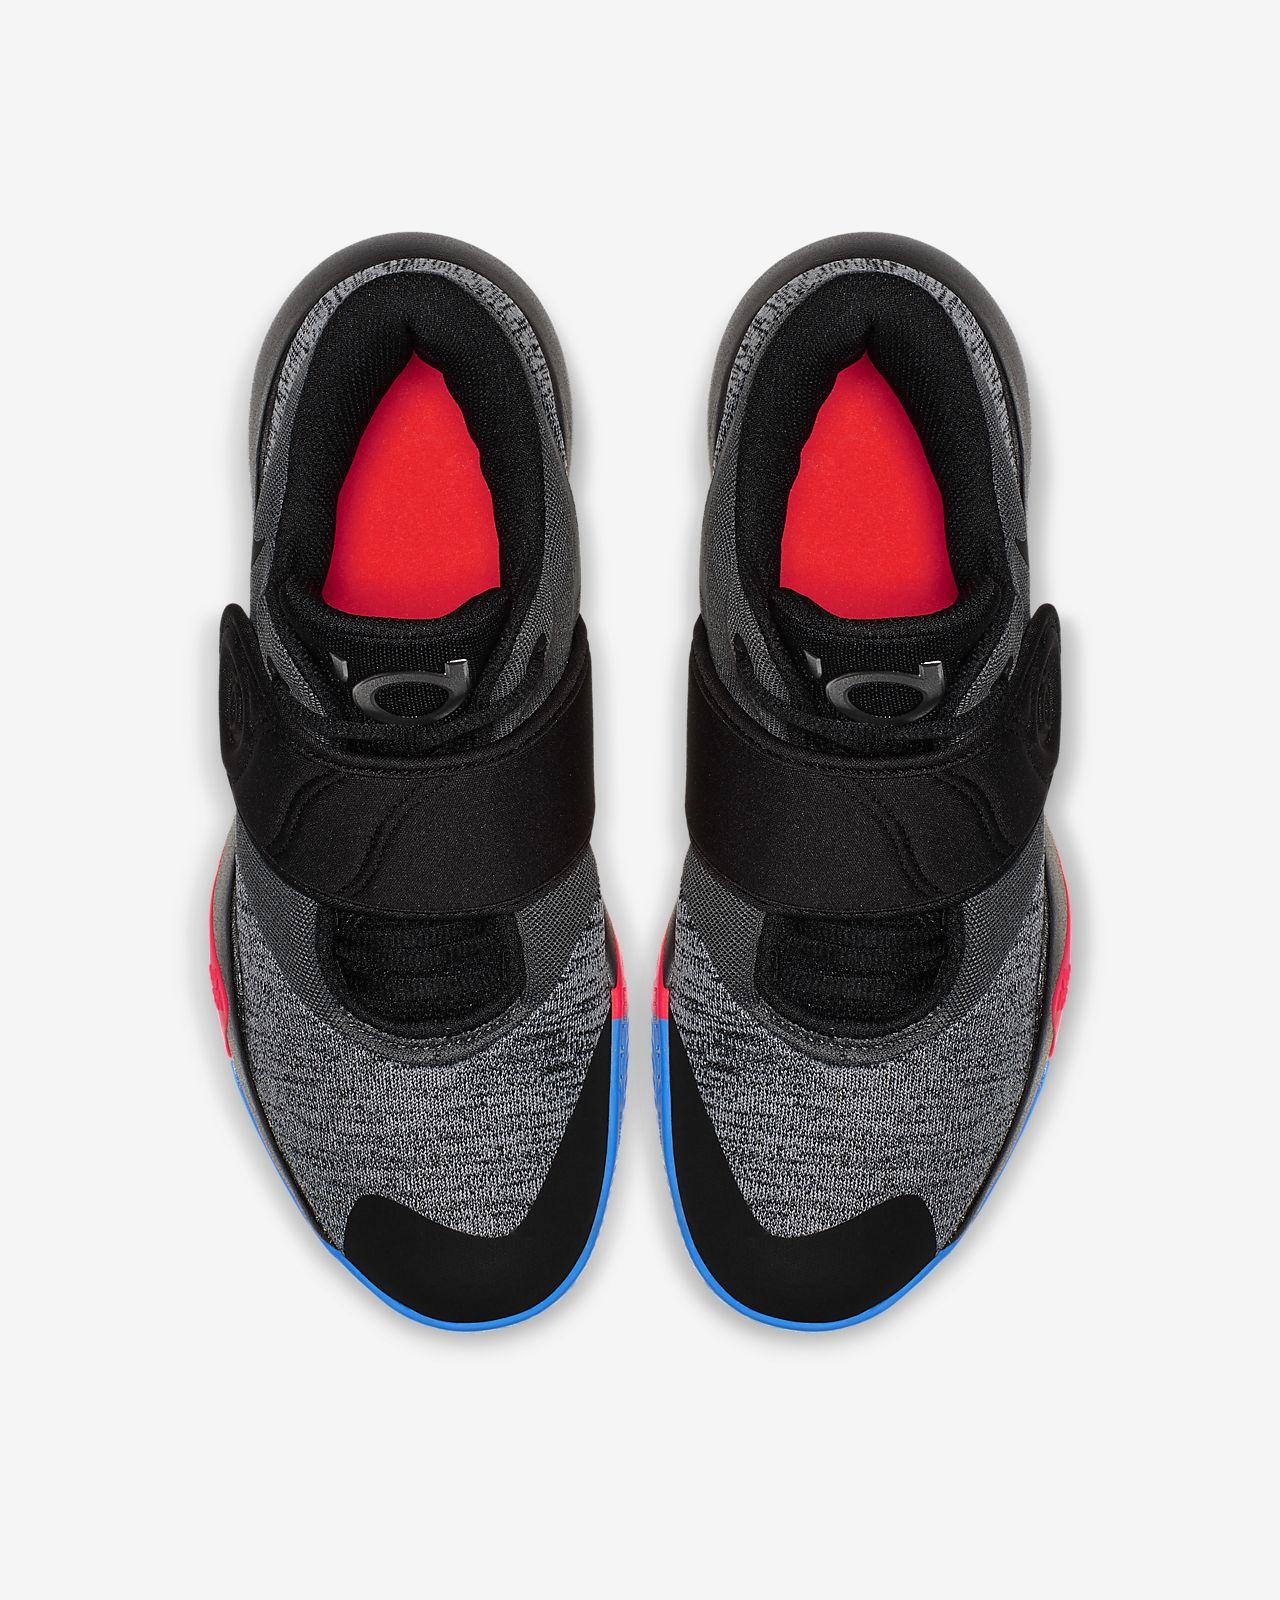 9f4970242673 Nike KD Trey 5 VI Basketball Shoe. Nike.com